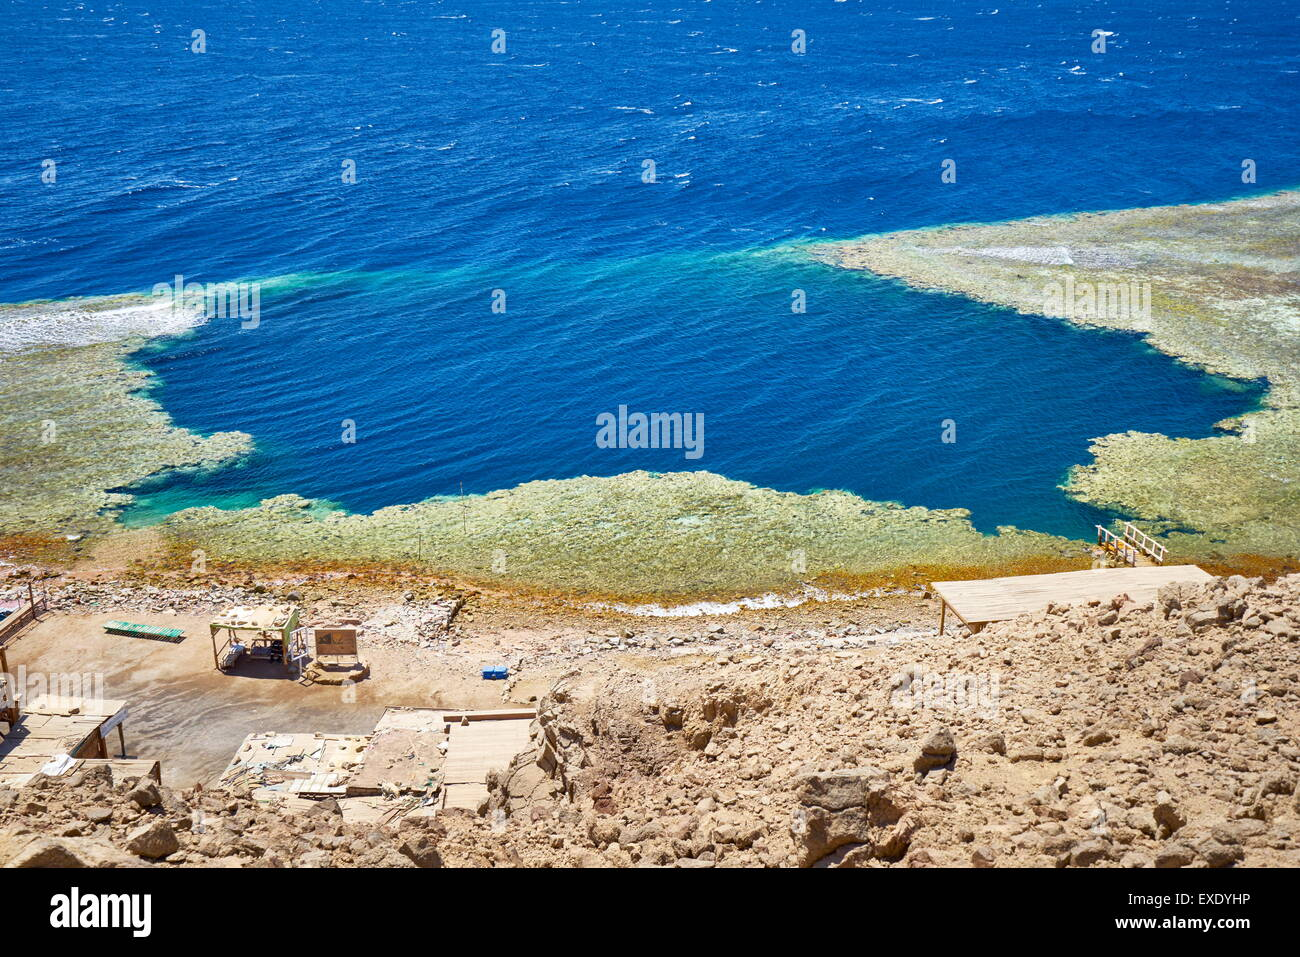 Blue hole, Dahab, Sinai, Red Sea, Egypt - Stock Image